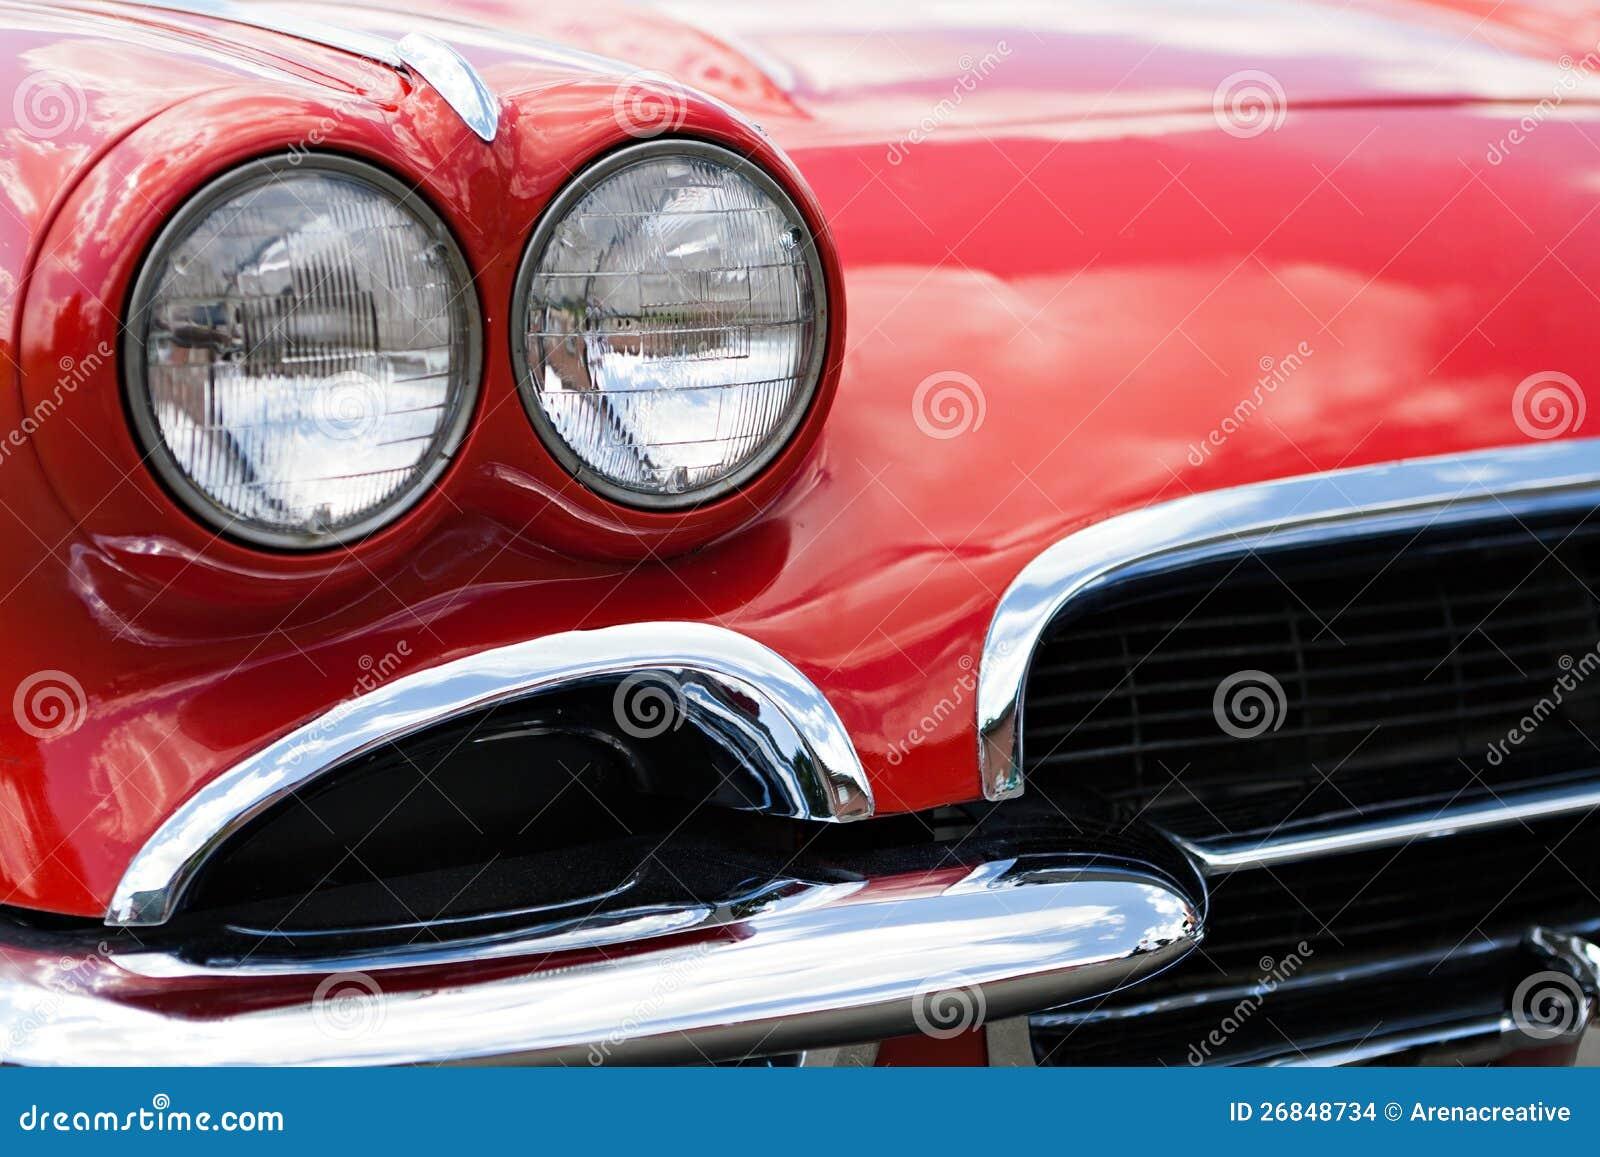 Old Car Headlights : Vintage sports car headlights stock photo image